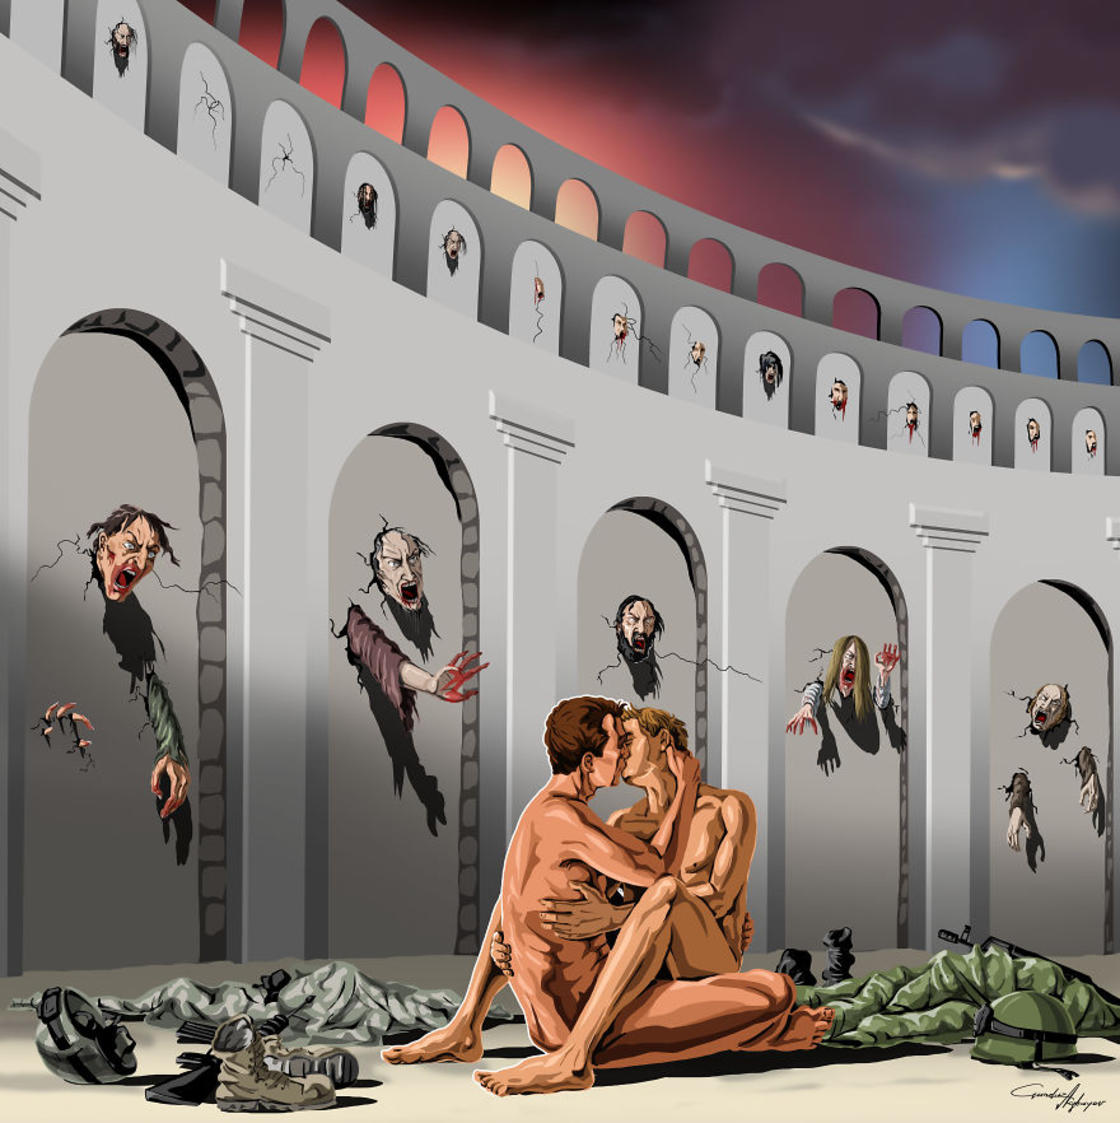 Sad World – The latest satirical illustrations by Gunduz Agayev